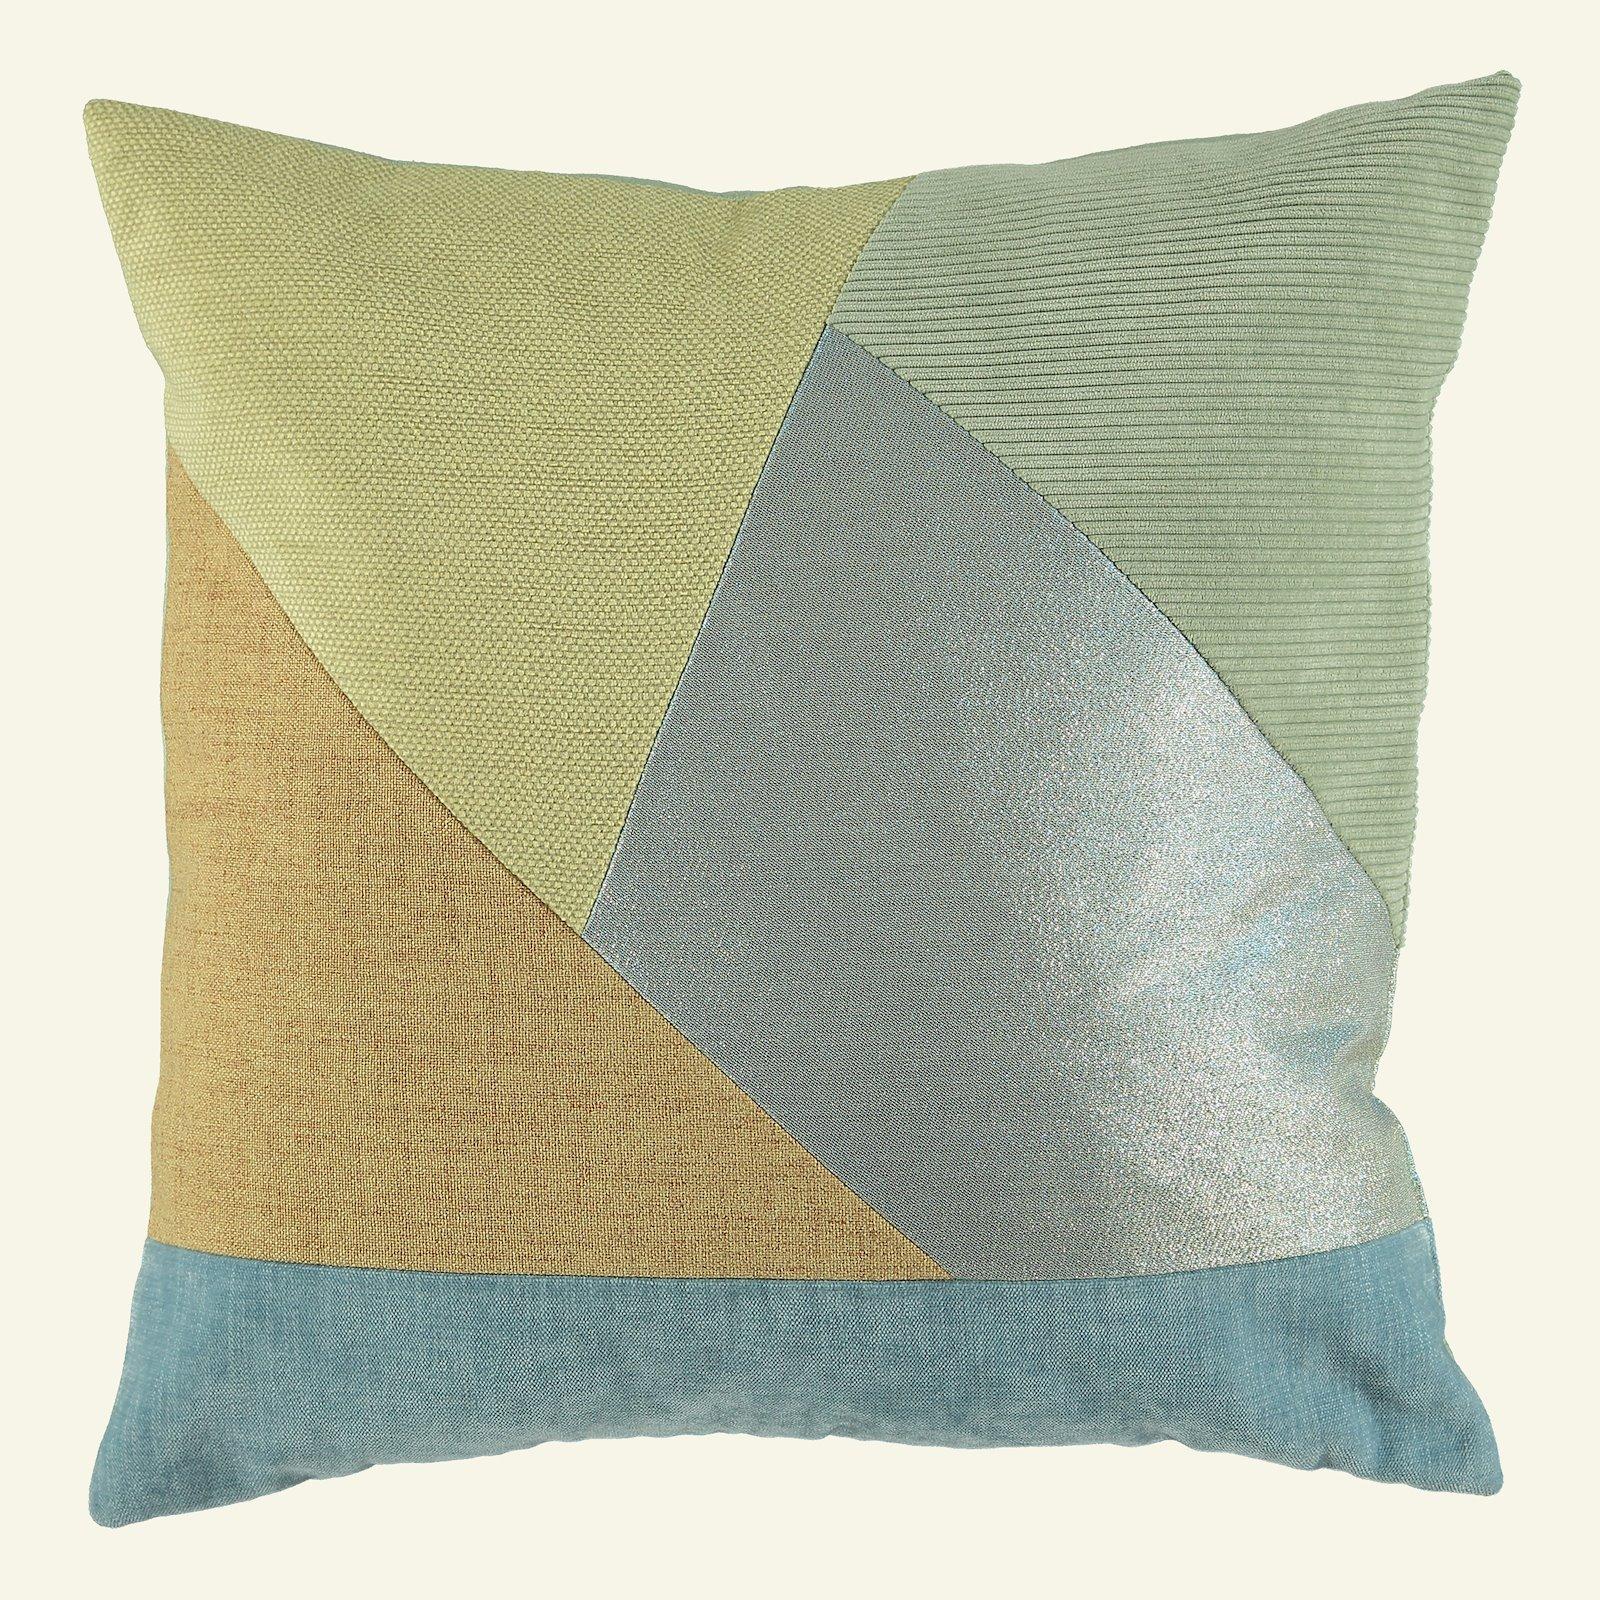 Upholstery corduroy 6 wales light sage 823947_824052_824049_400321_824035_sskit